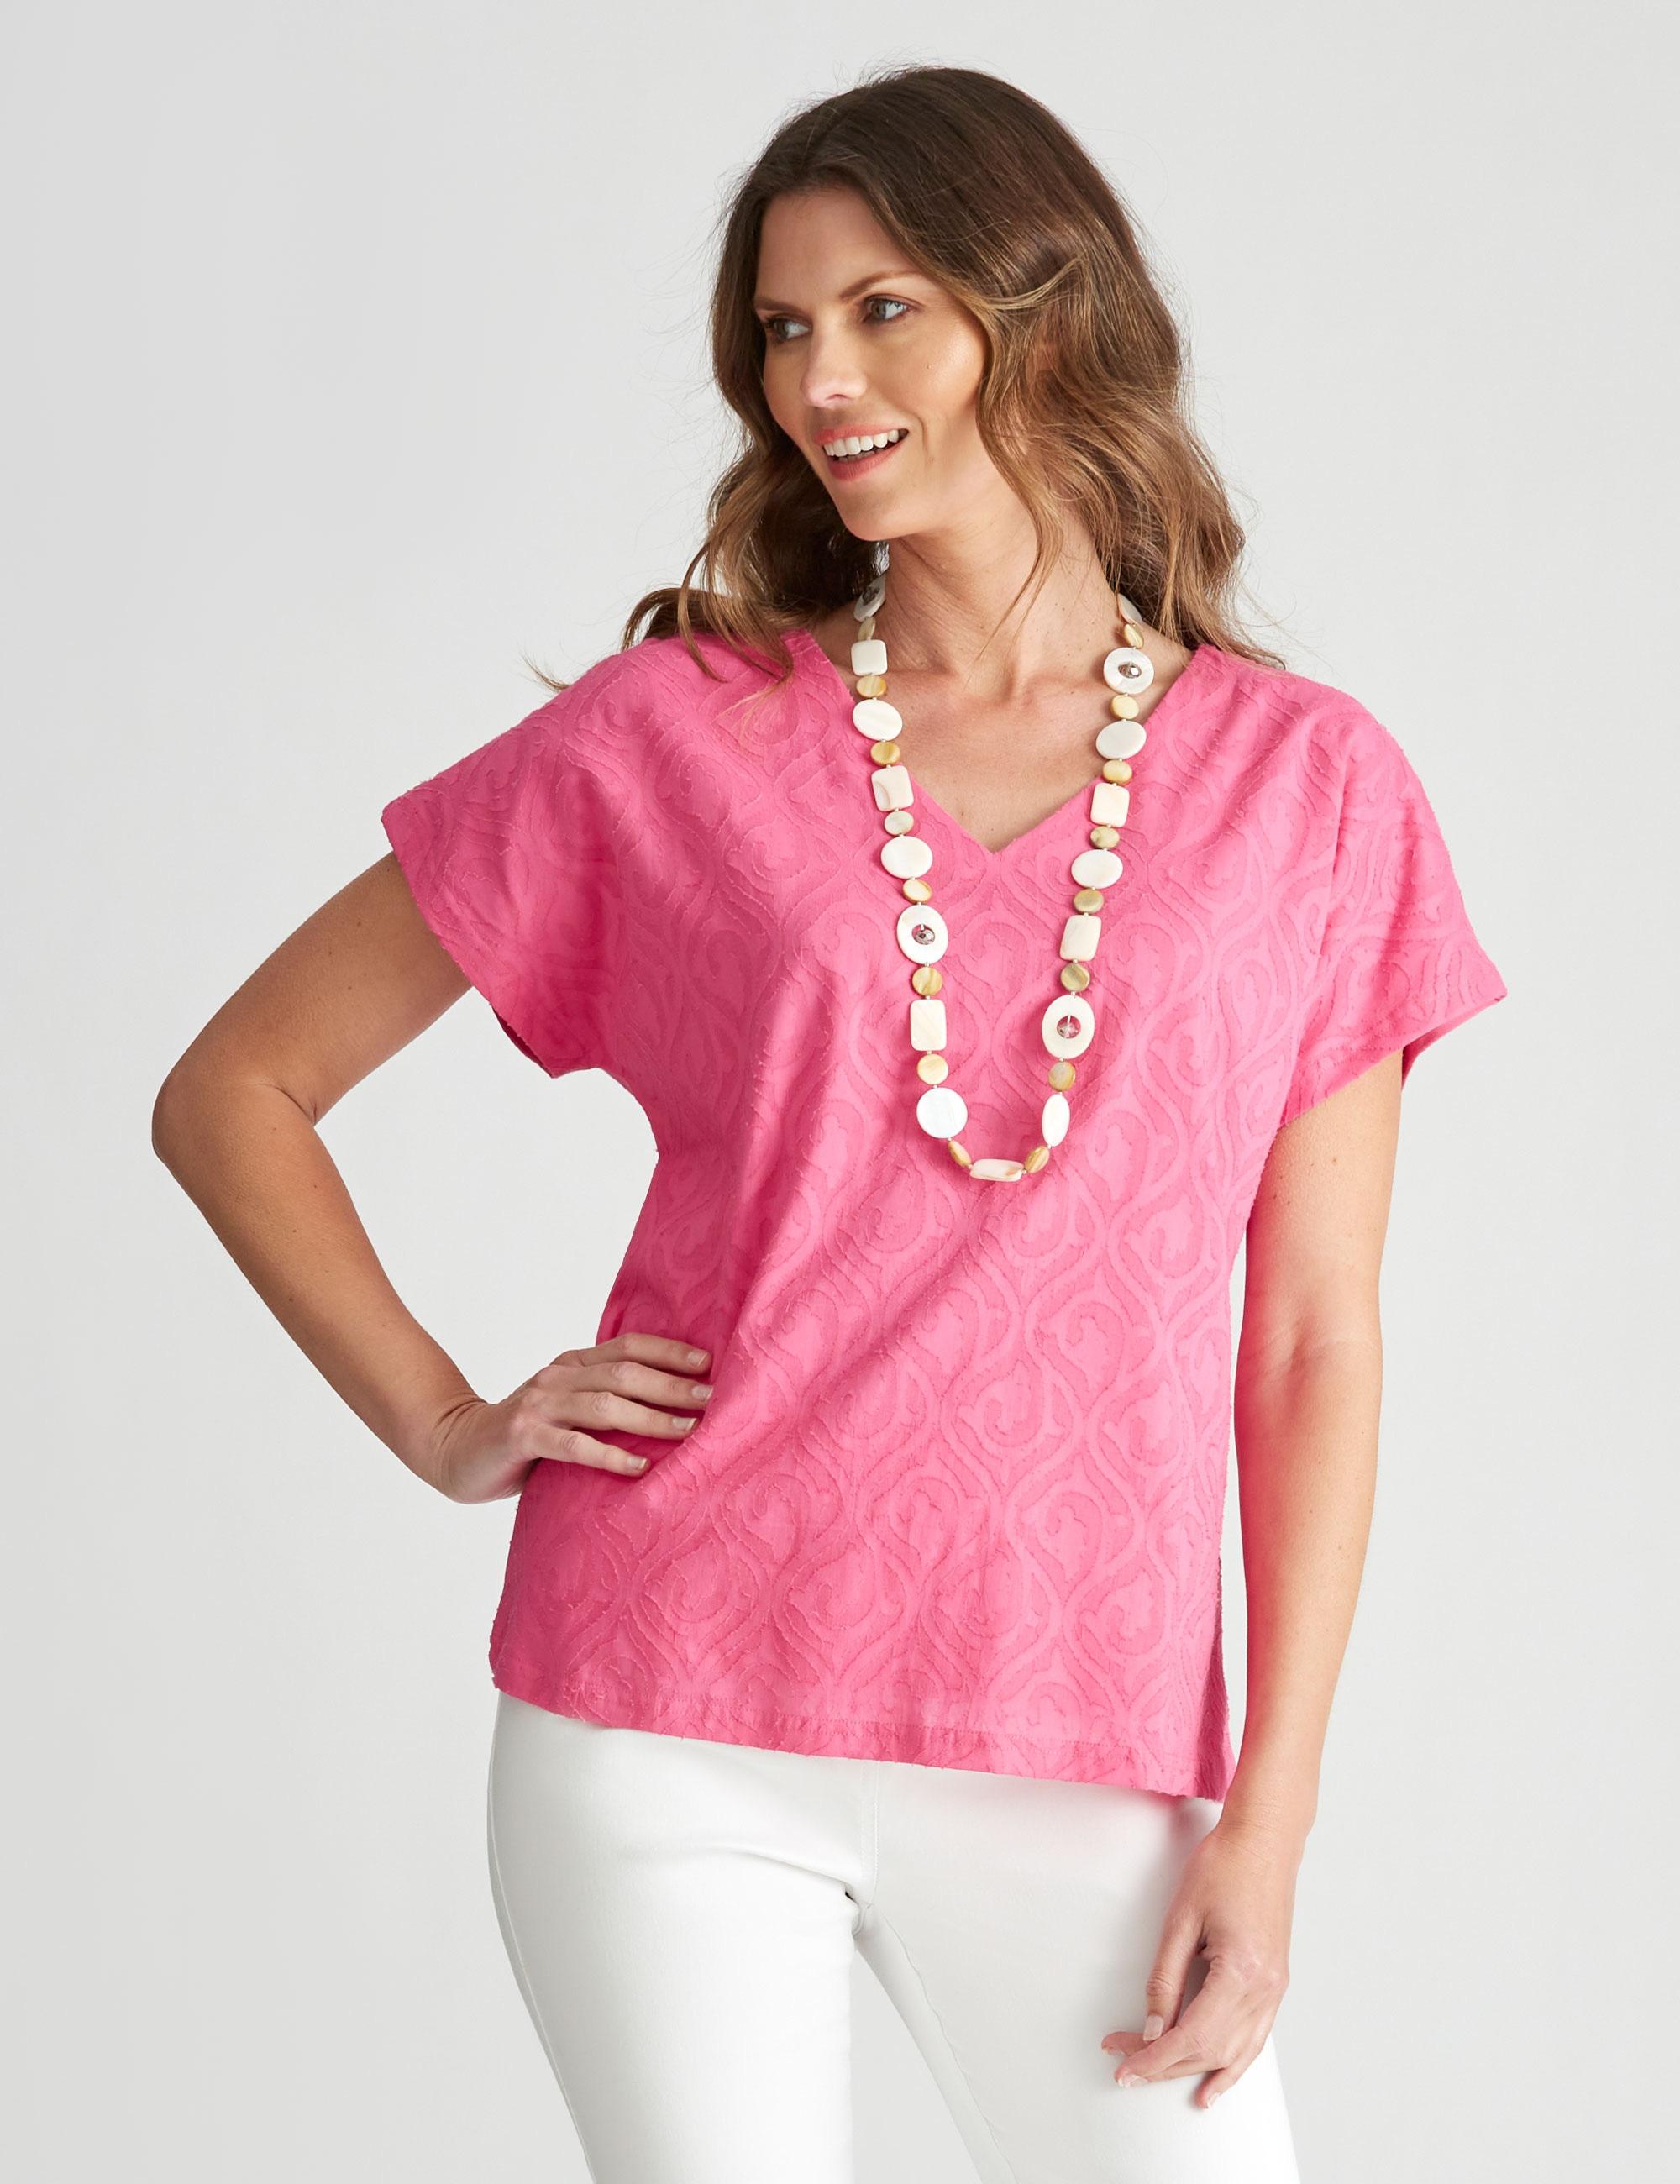 1056108700 1 - Women Fashion